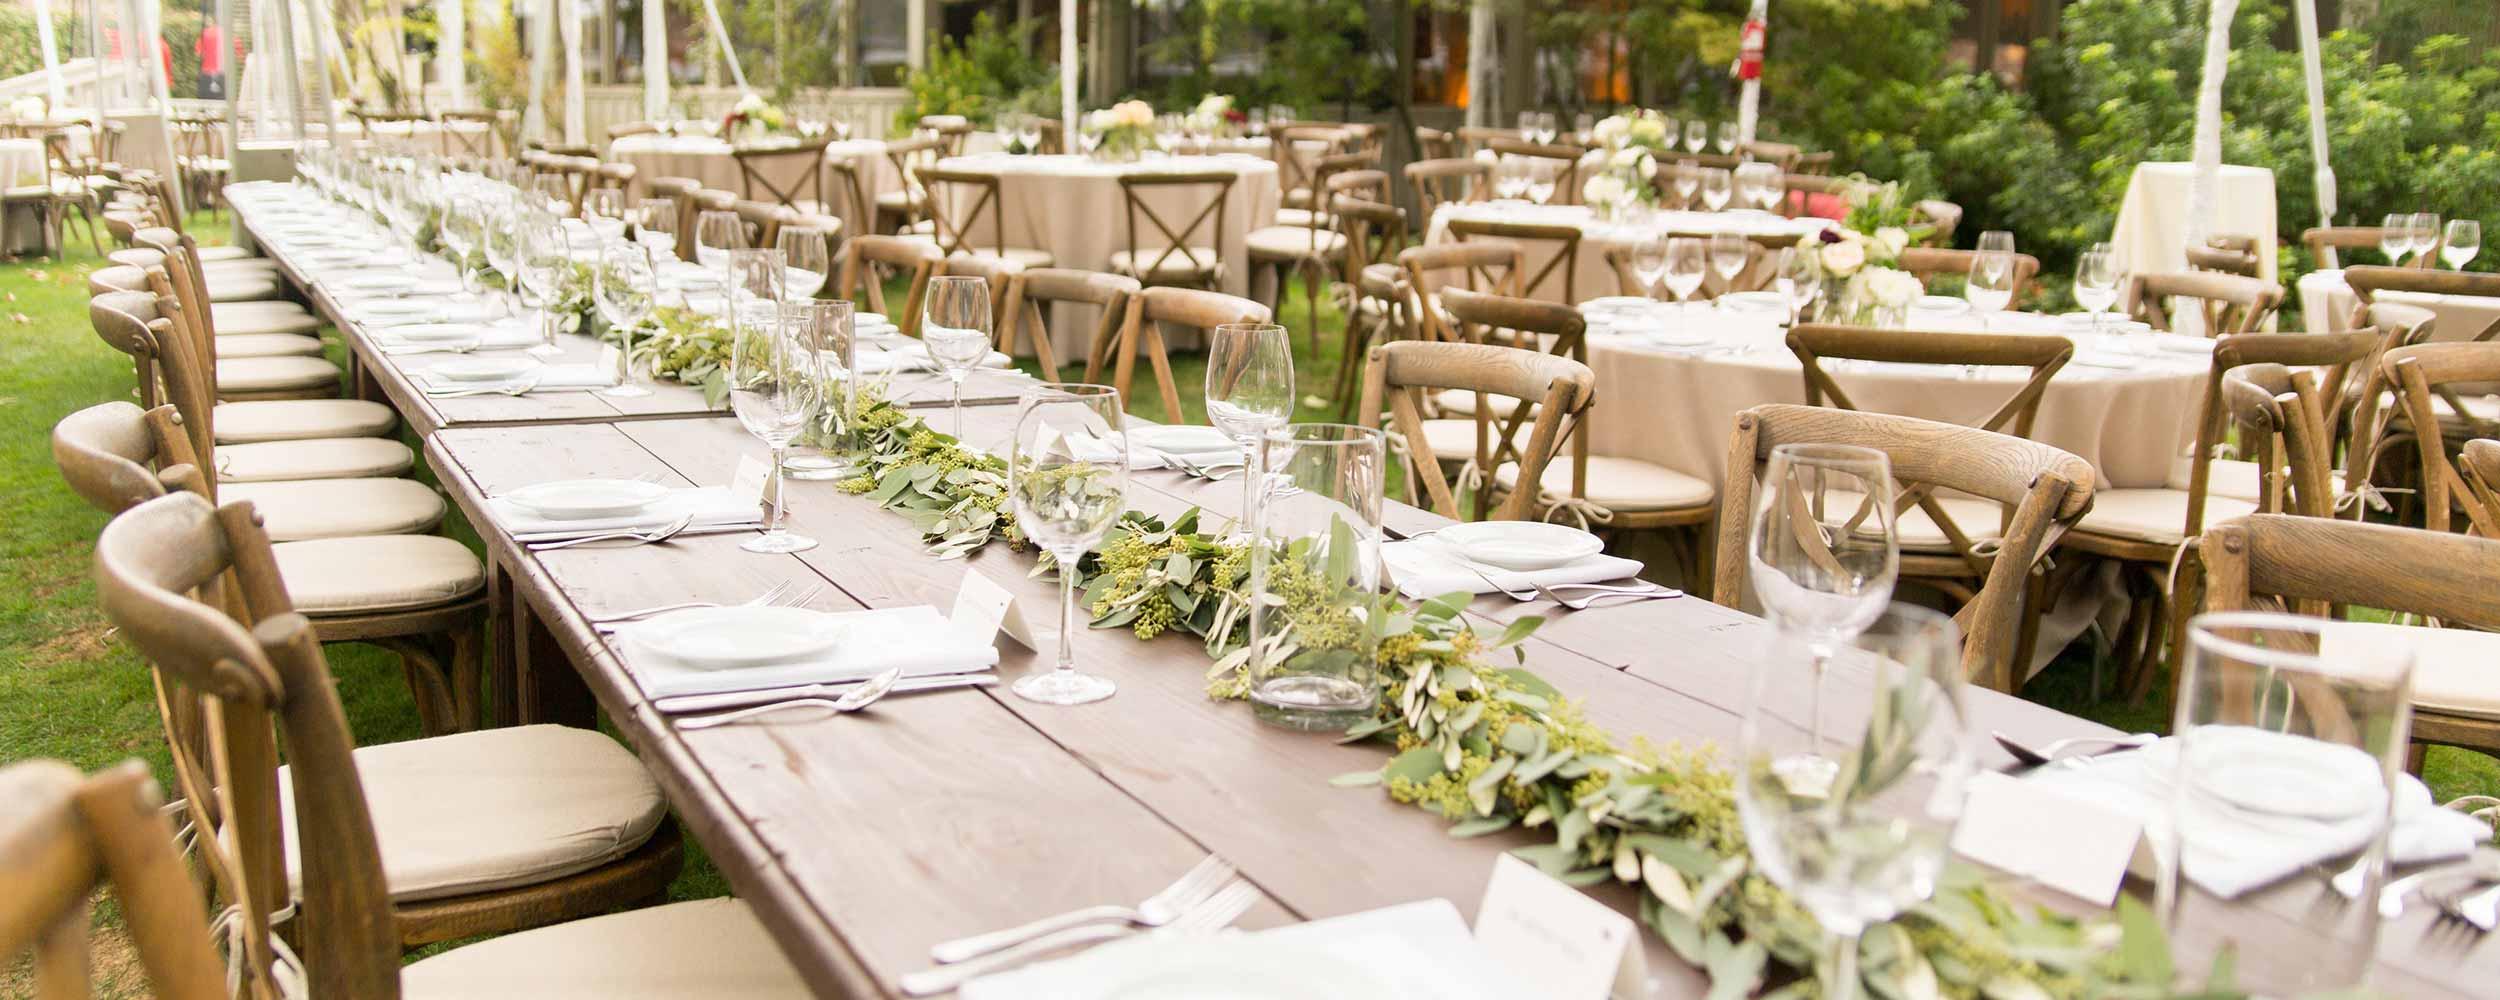 Alisal wedding venue - Alisal Resort in Solvang California